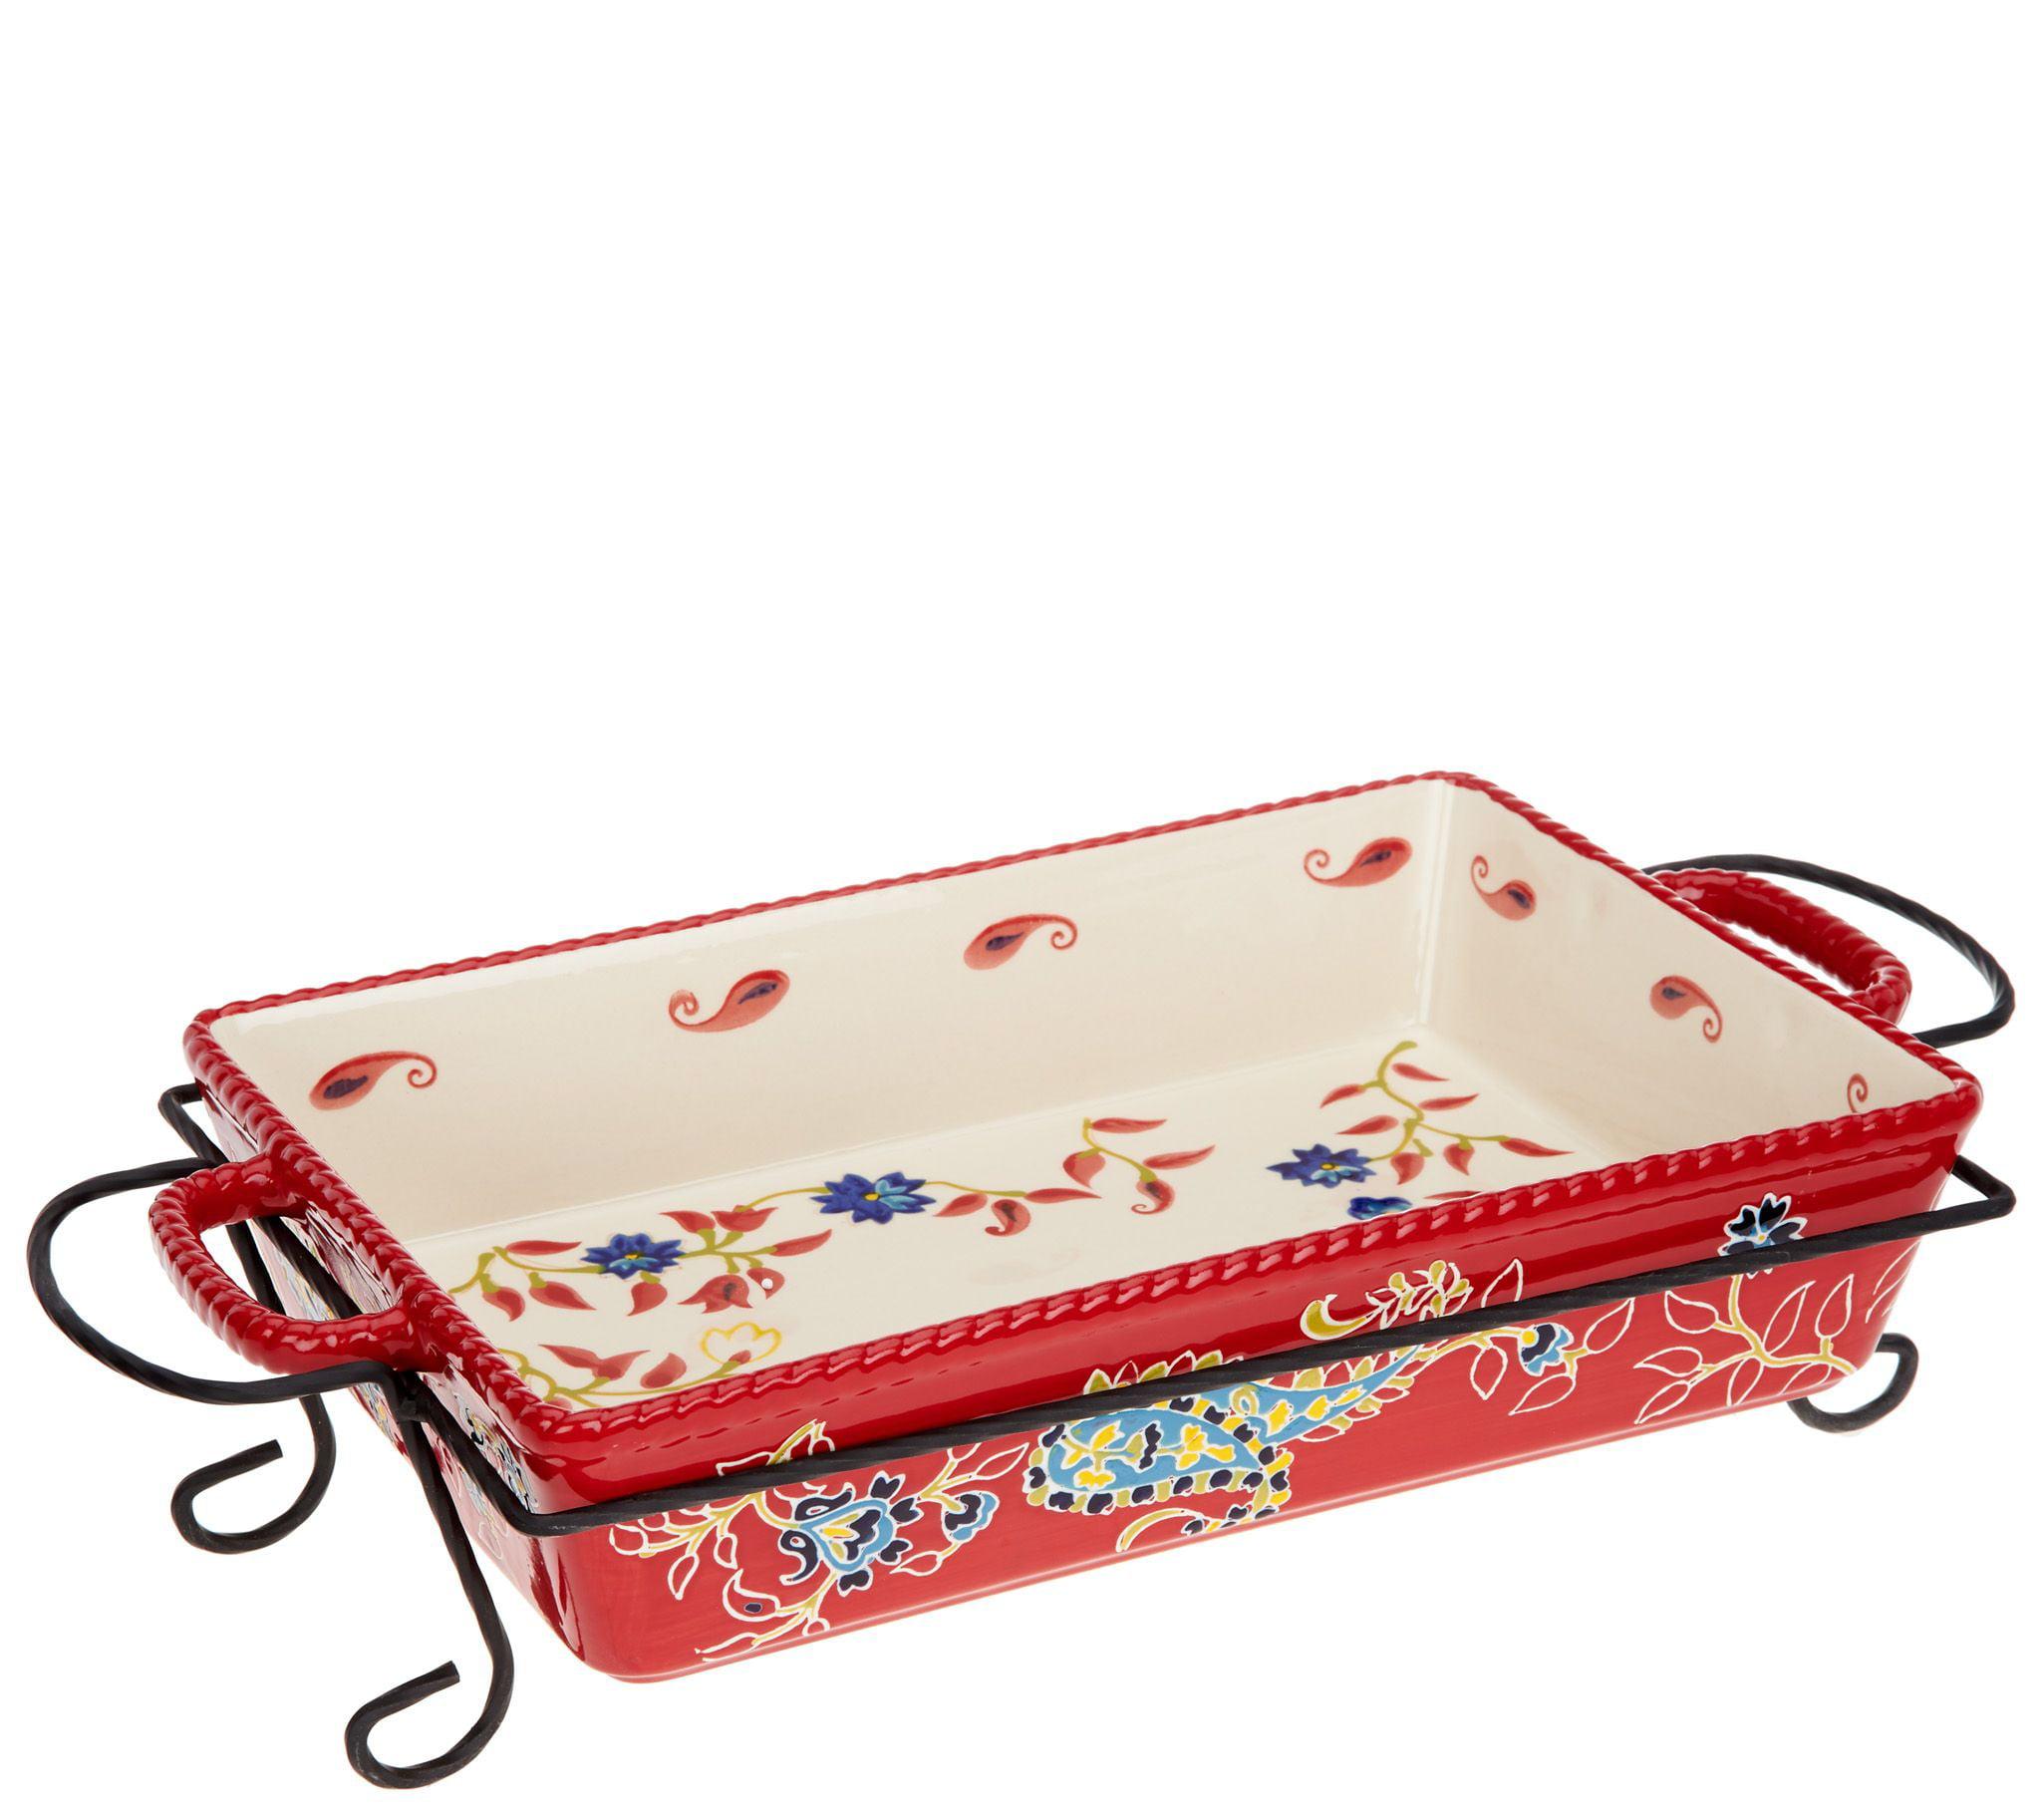 Valerie Bertinelli 6 Piece Bake Serve Set K47190 For Kitchen And Cooking Walmart Com Walmart Com